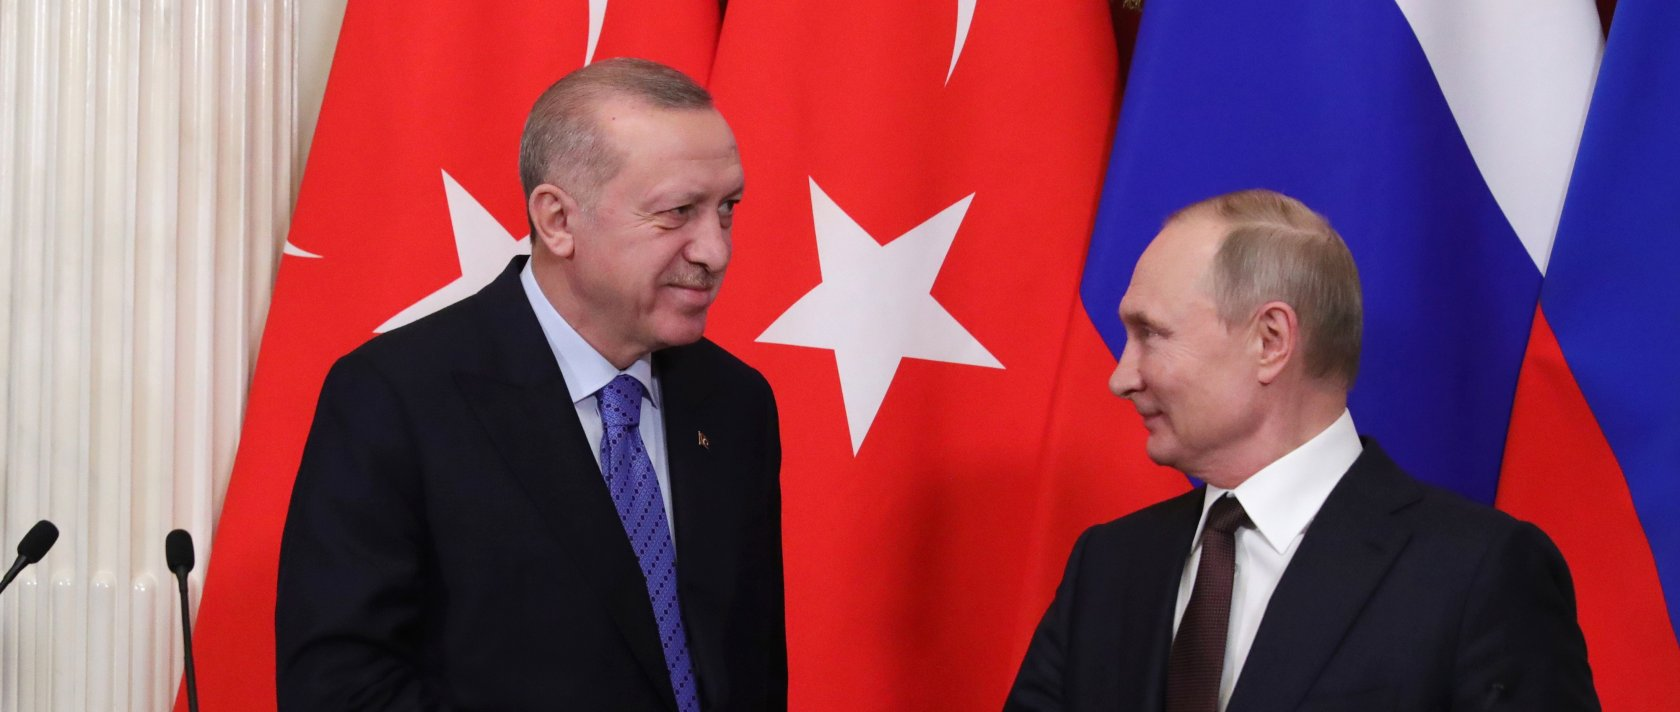 President Erdoğan to pressure Putin to restore peace in Idlib